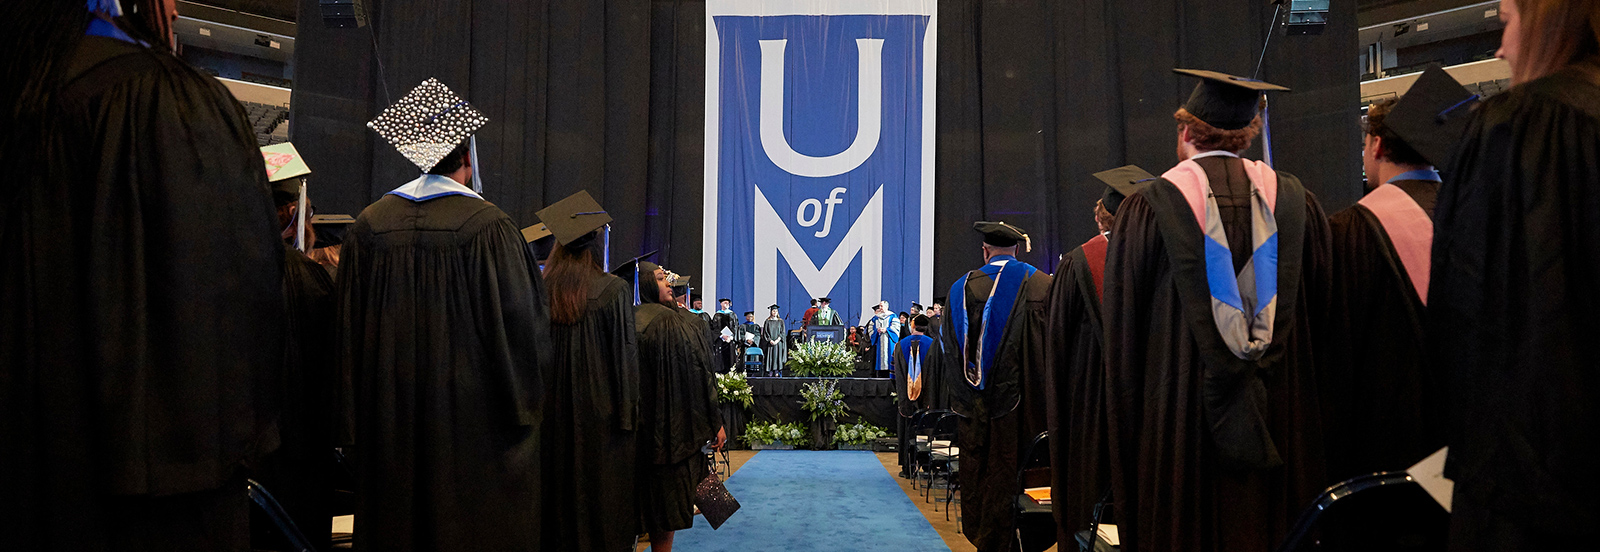 UofM graduate